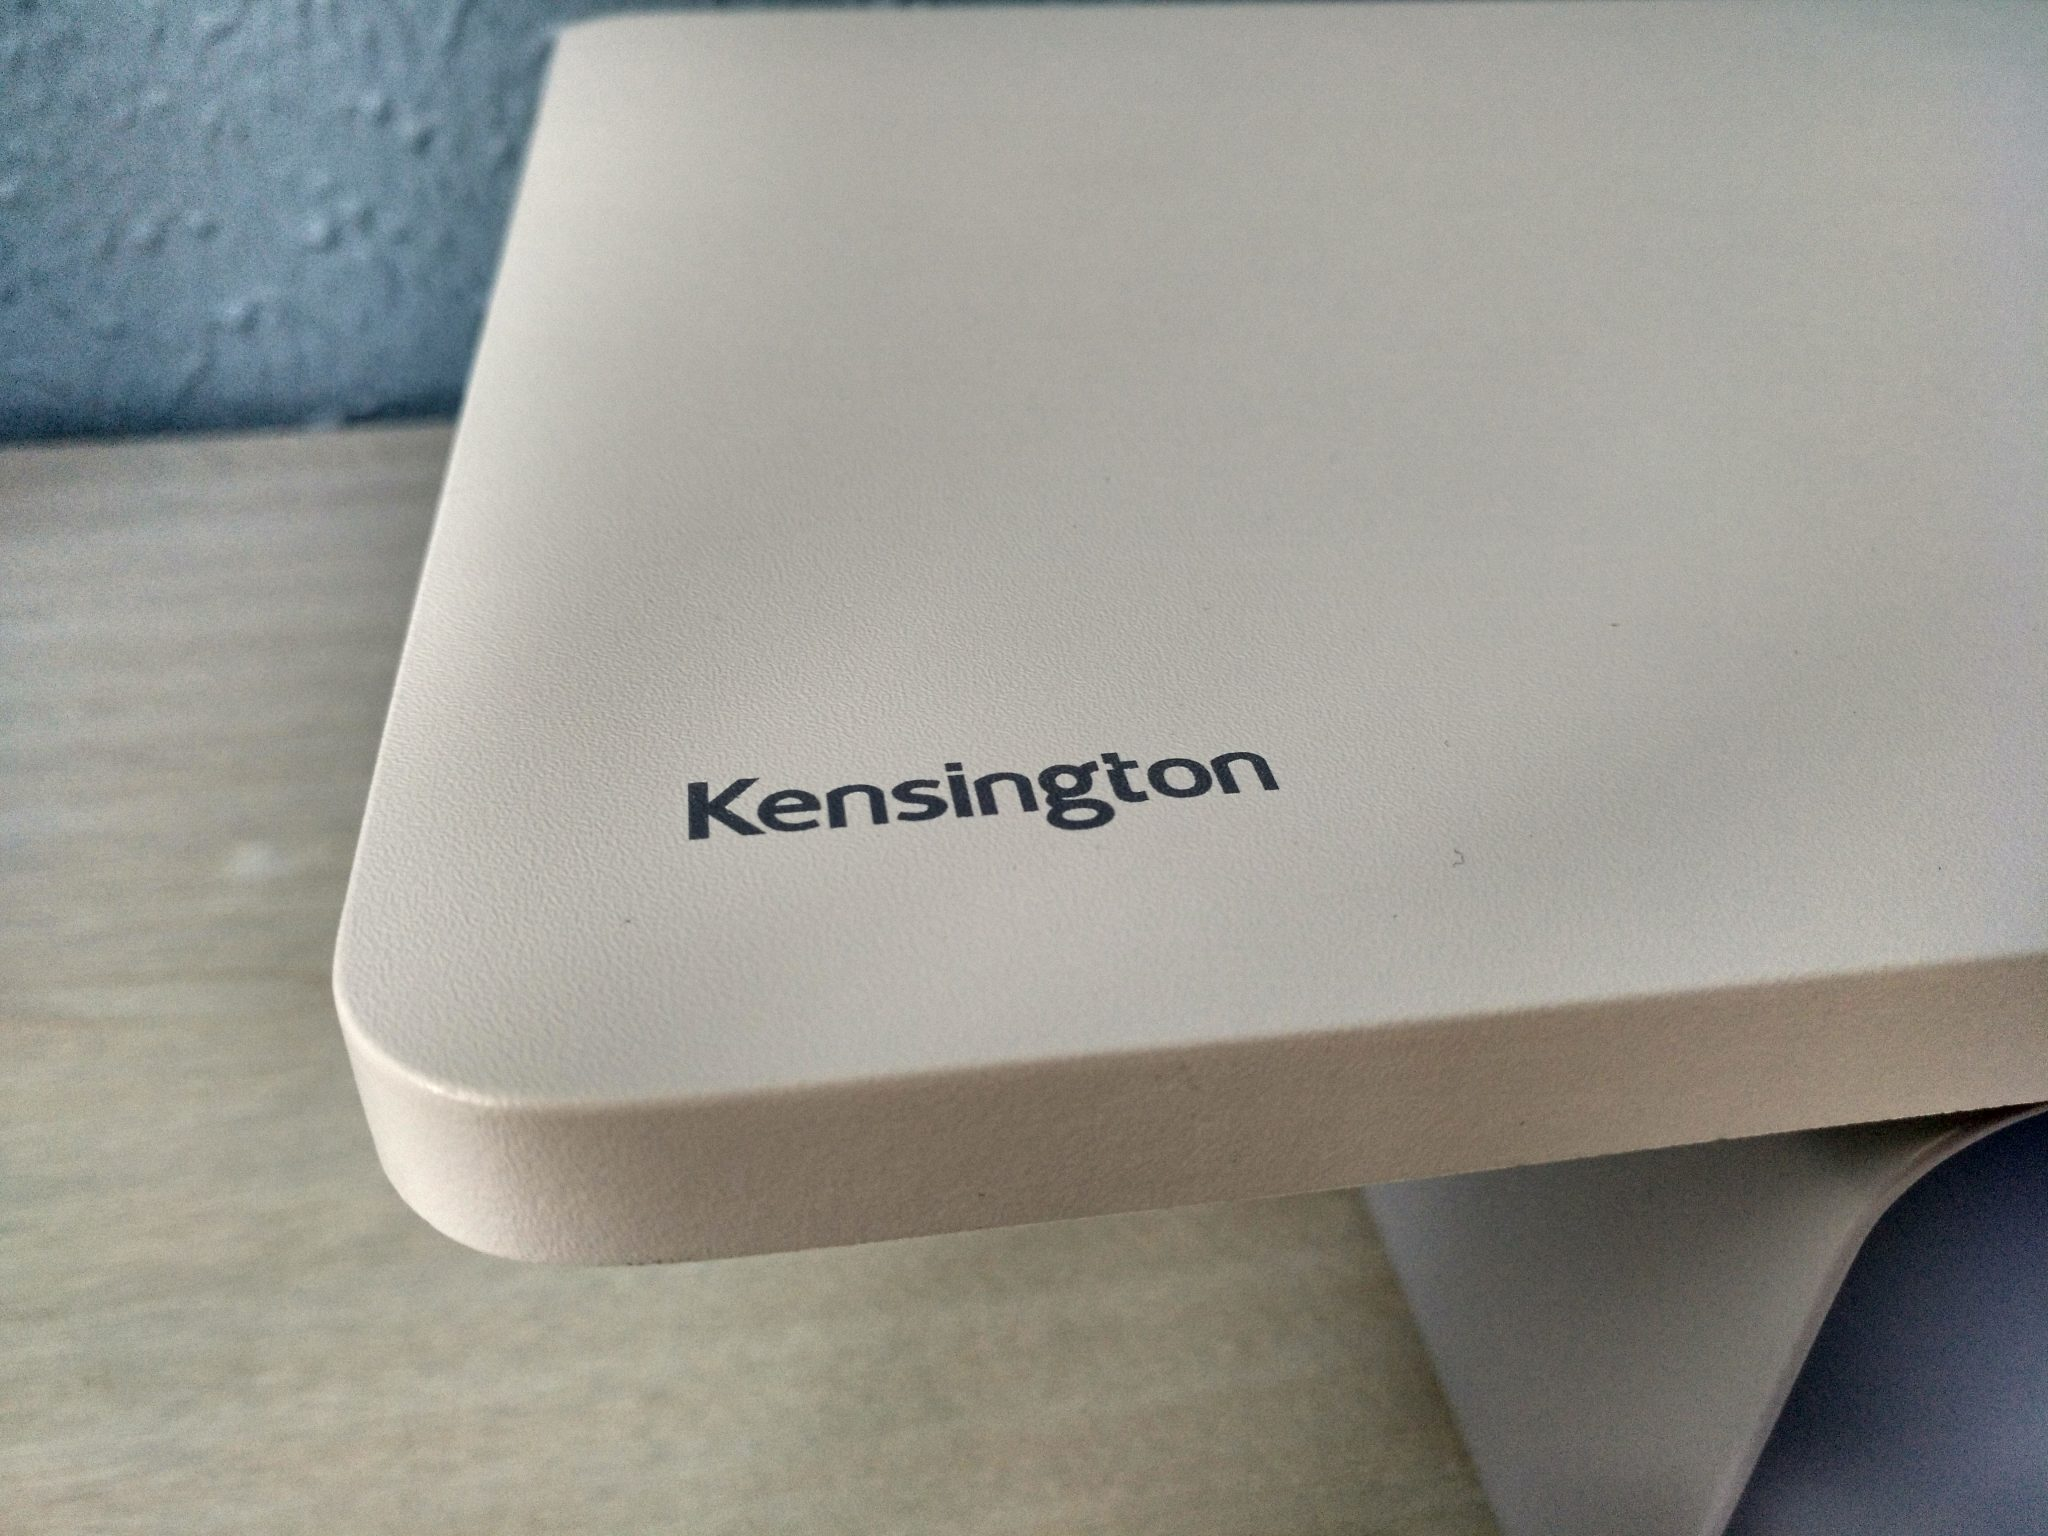 Soporte Kensington FreshView™ para monitor con purificador de aire